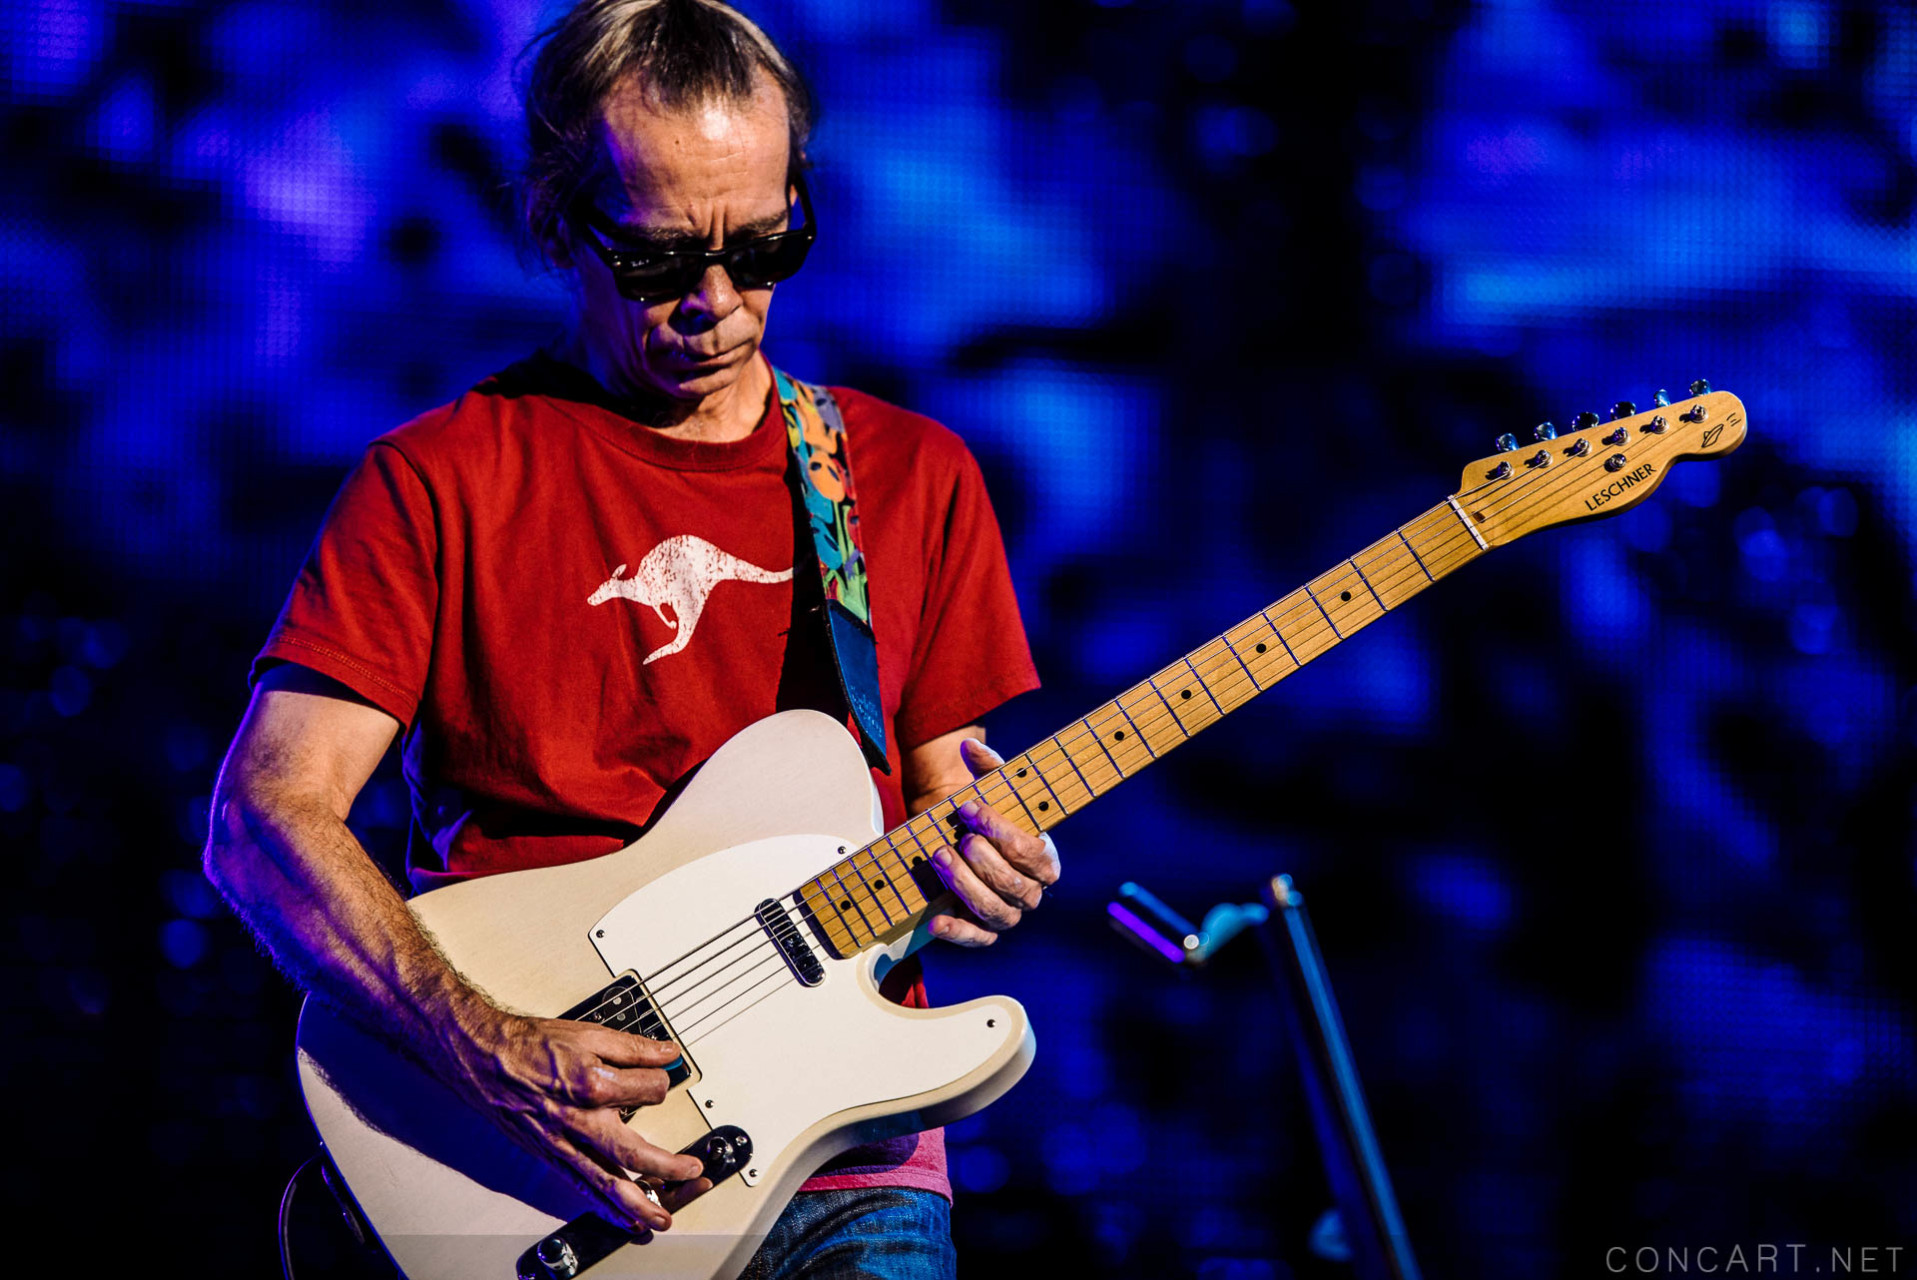 Dave Matthews Band photo by Sean Molin 52